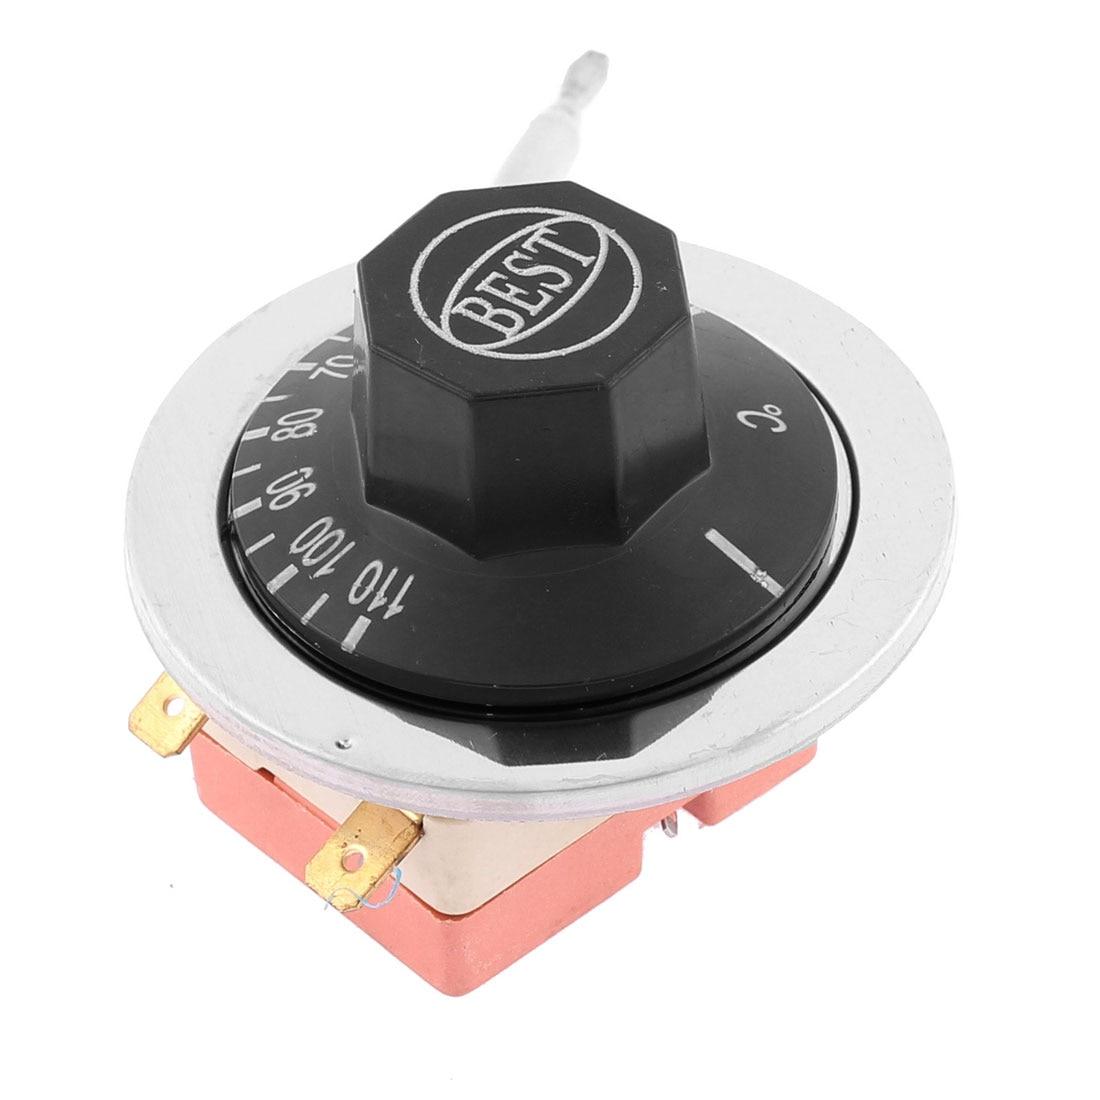 Tel72 9001b dedicated digital temperature oven oven thermostat  #B52A16